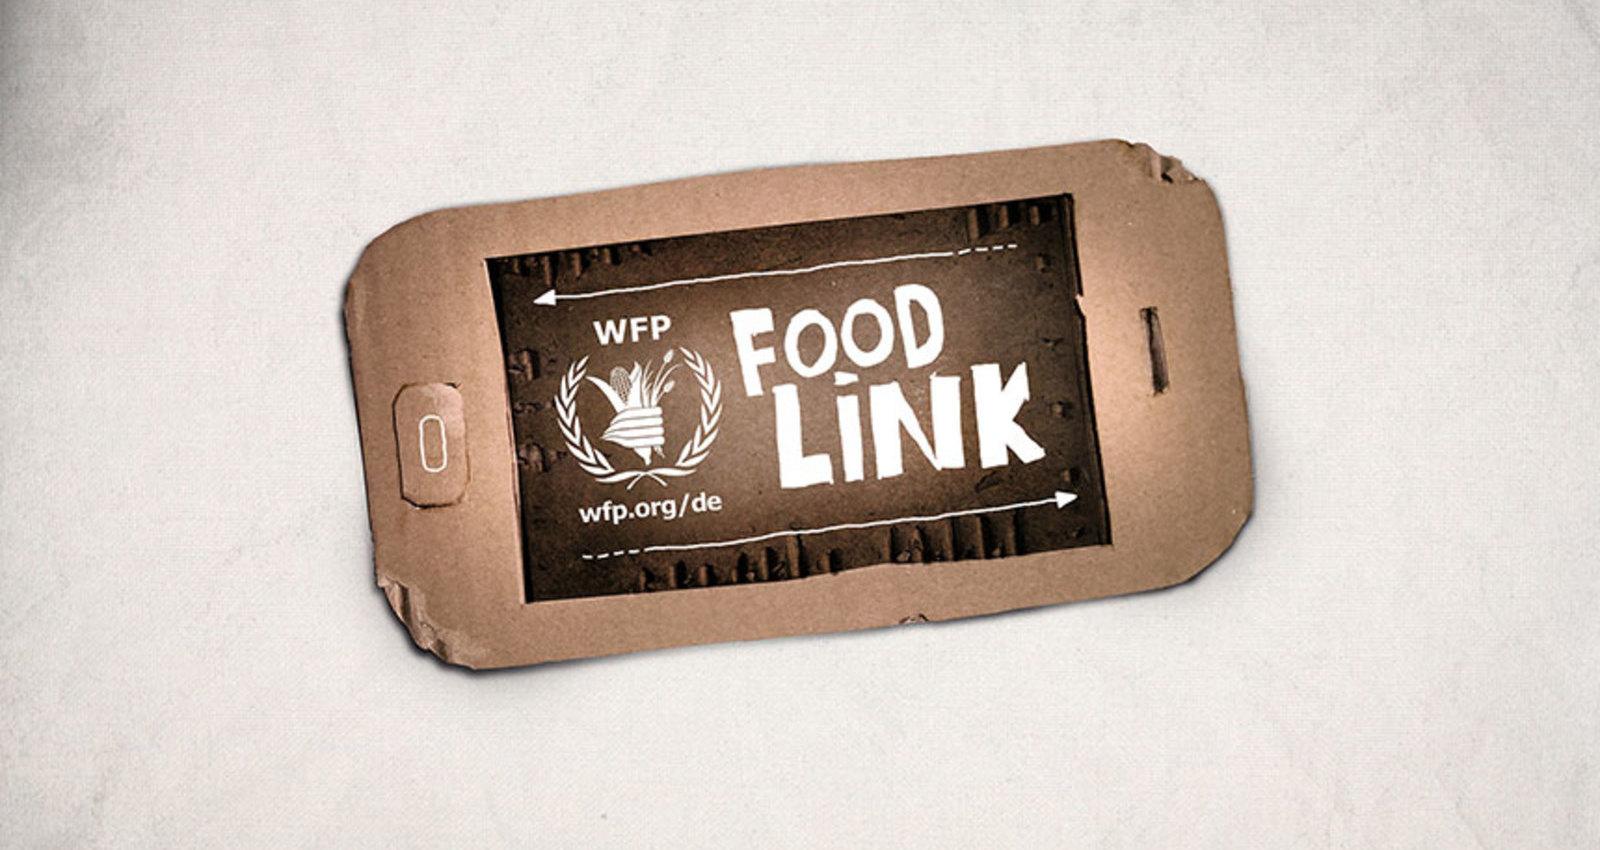 WFP Food Link